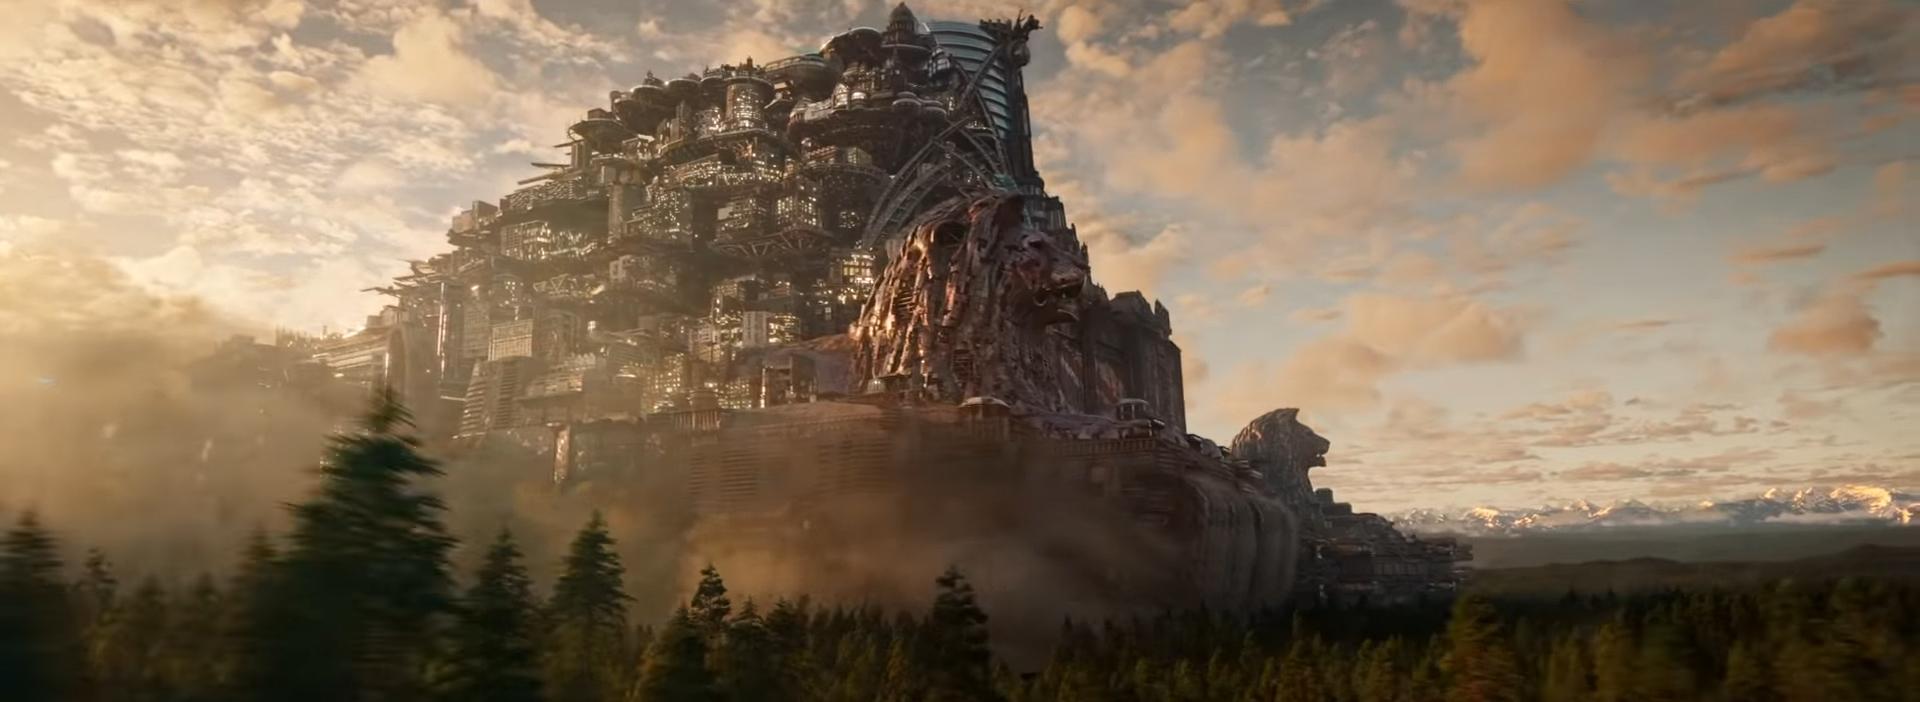 Mortal Engines. Image Credit: Universal